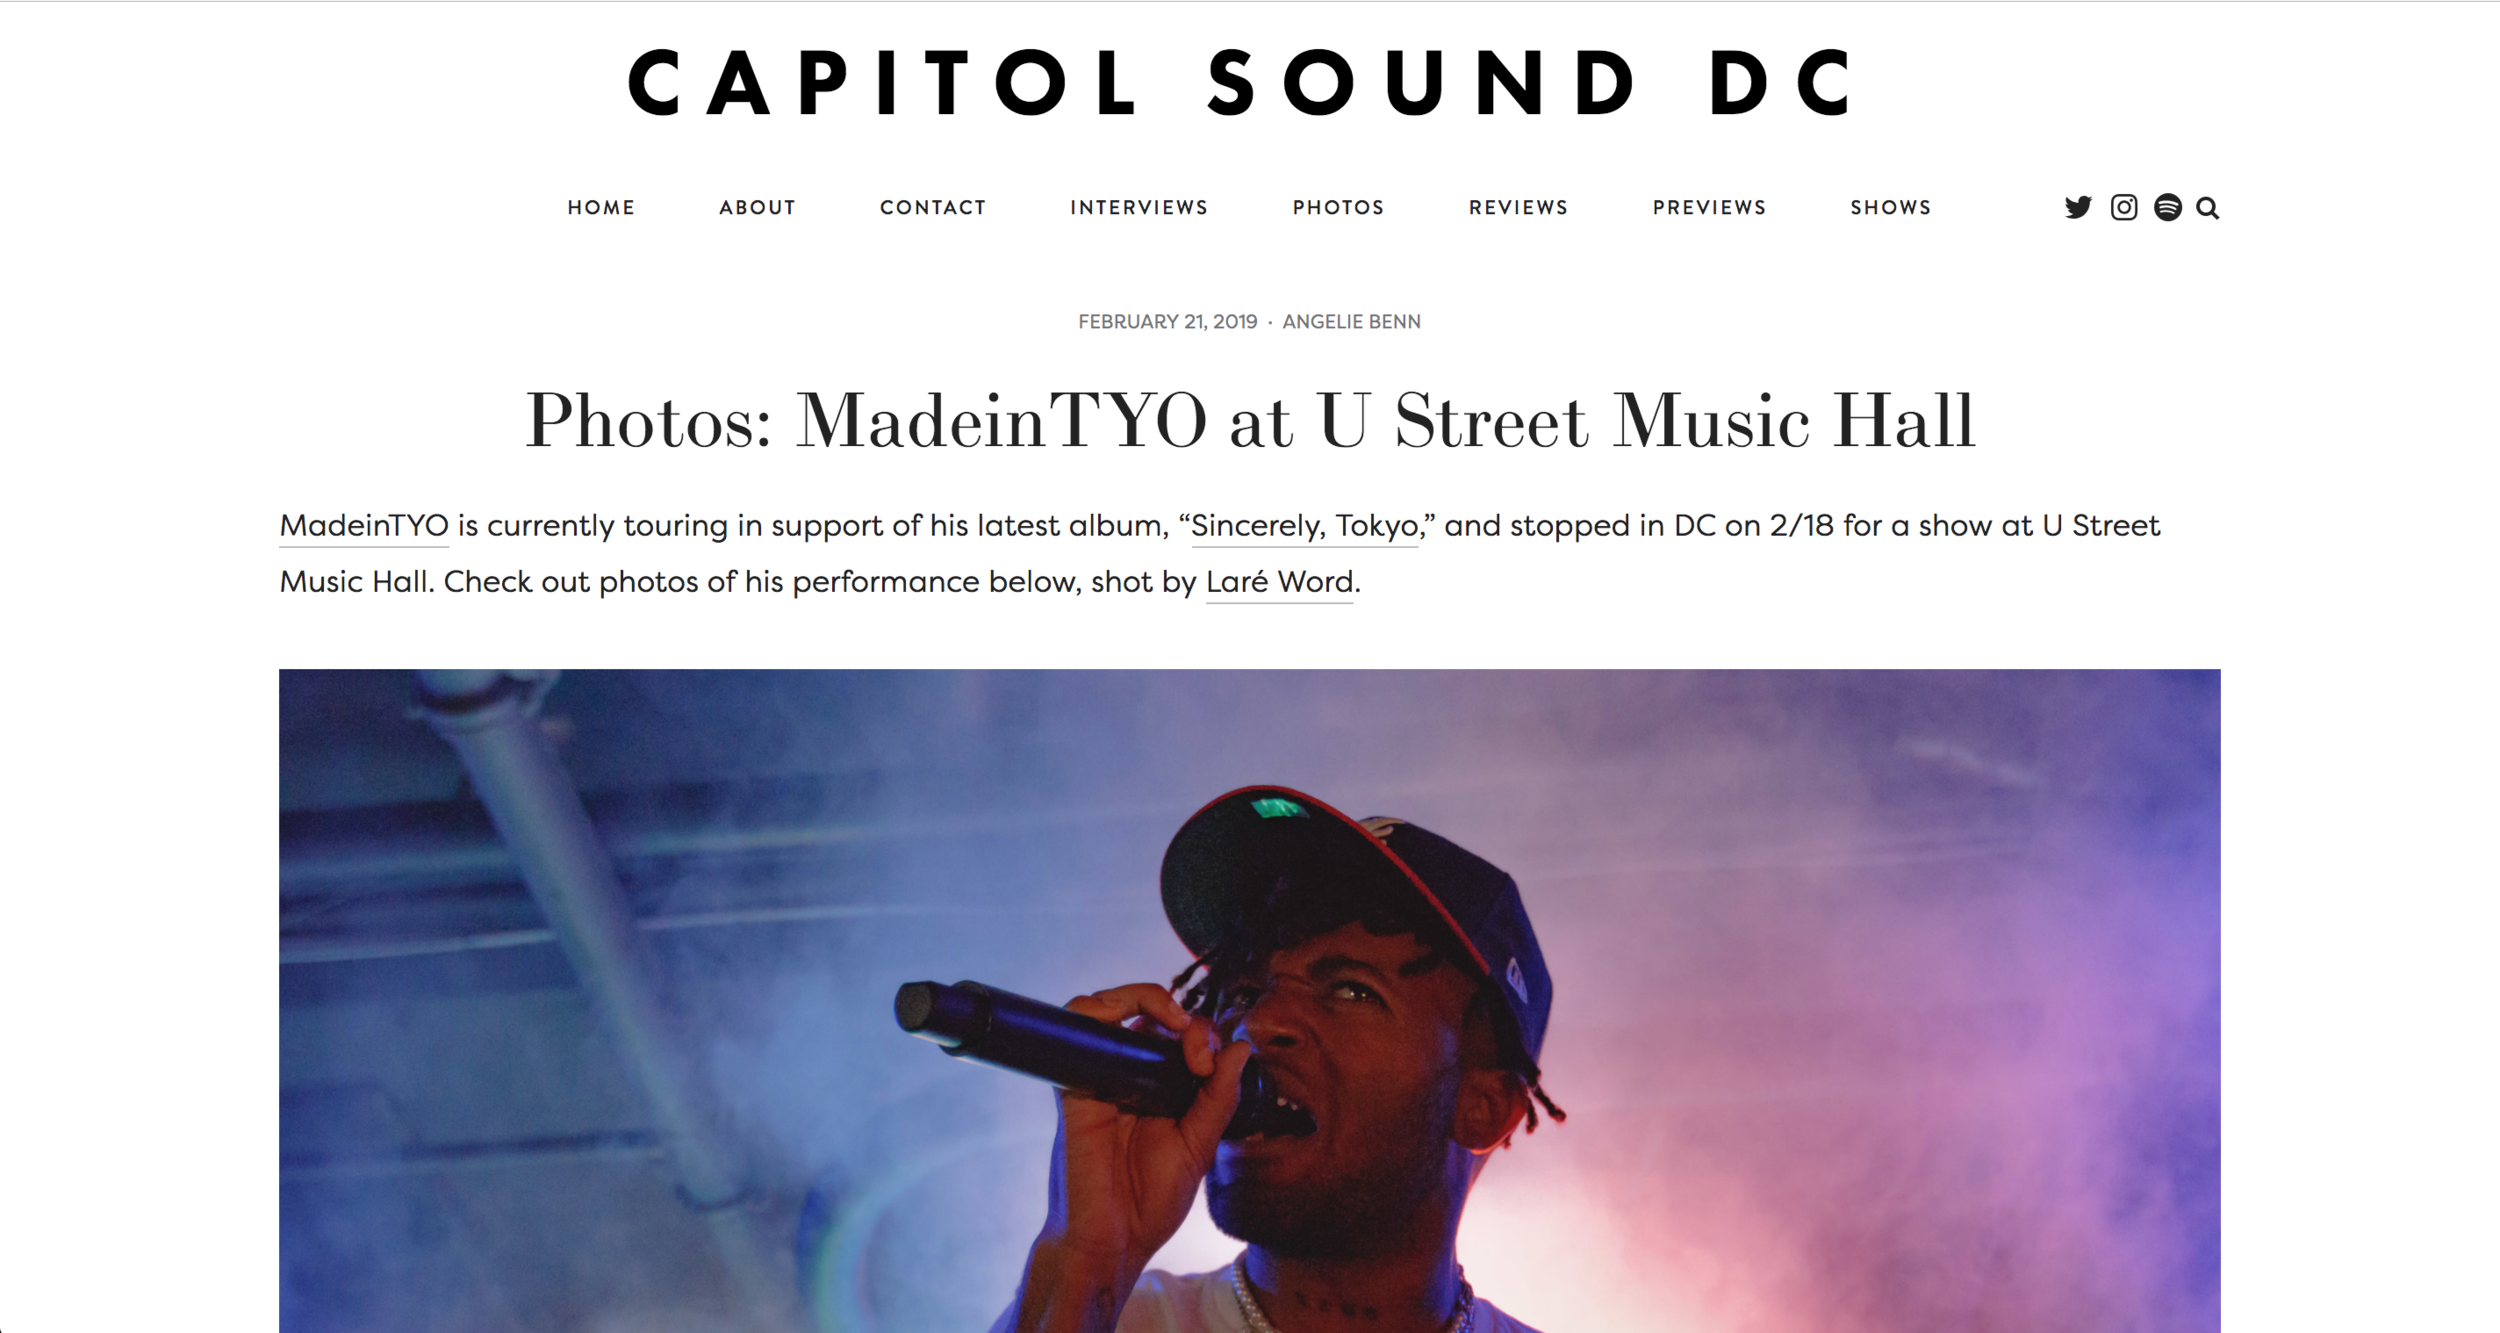 https://capitolsounddc.com/capitol-sound/2019/photos-madeintyo-at-u-street-music-hall